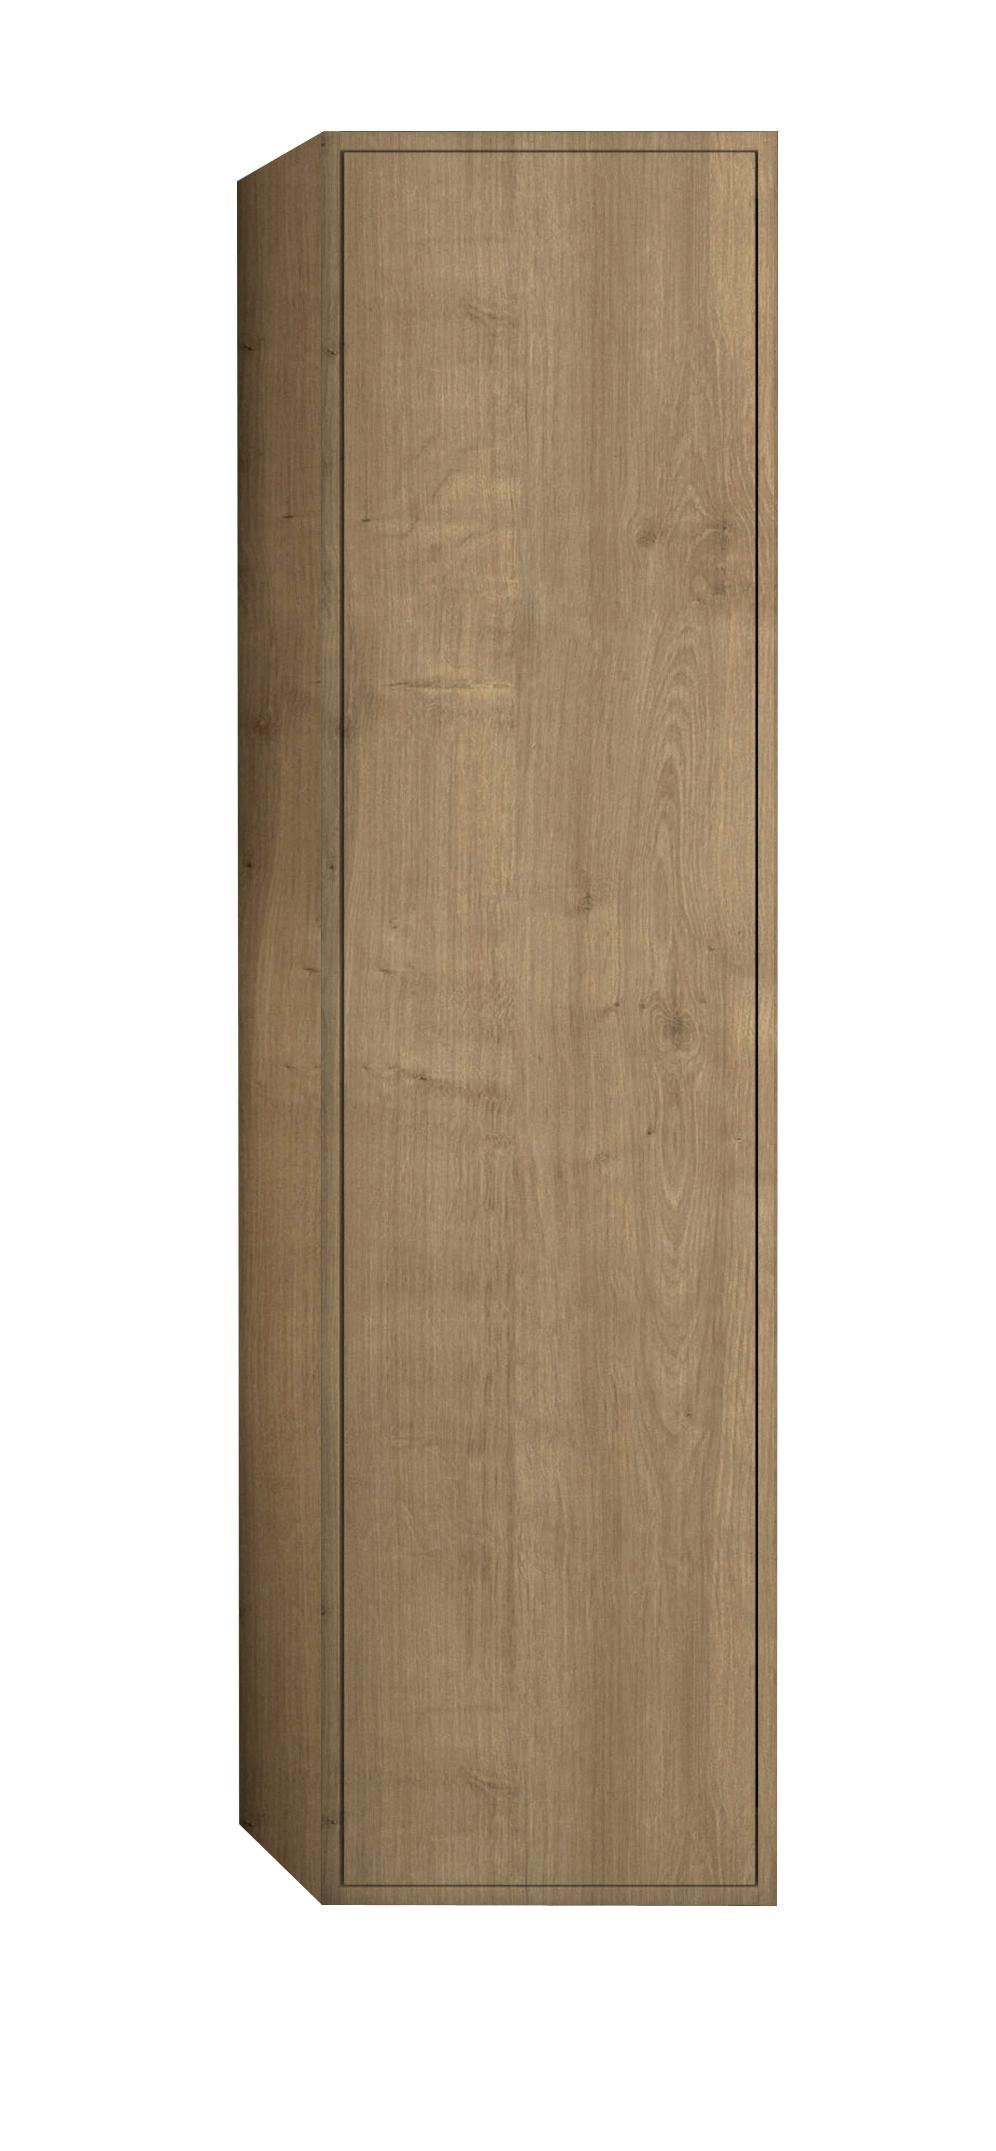 MARNY Kolomkast 40 cm deur - Eik Arlington